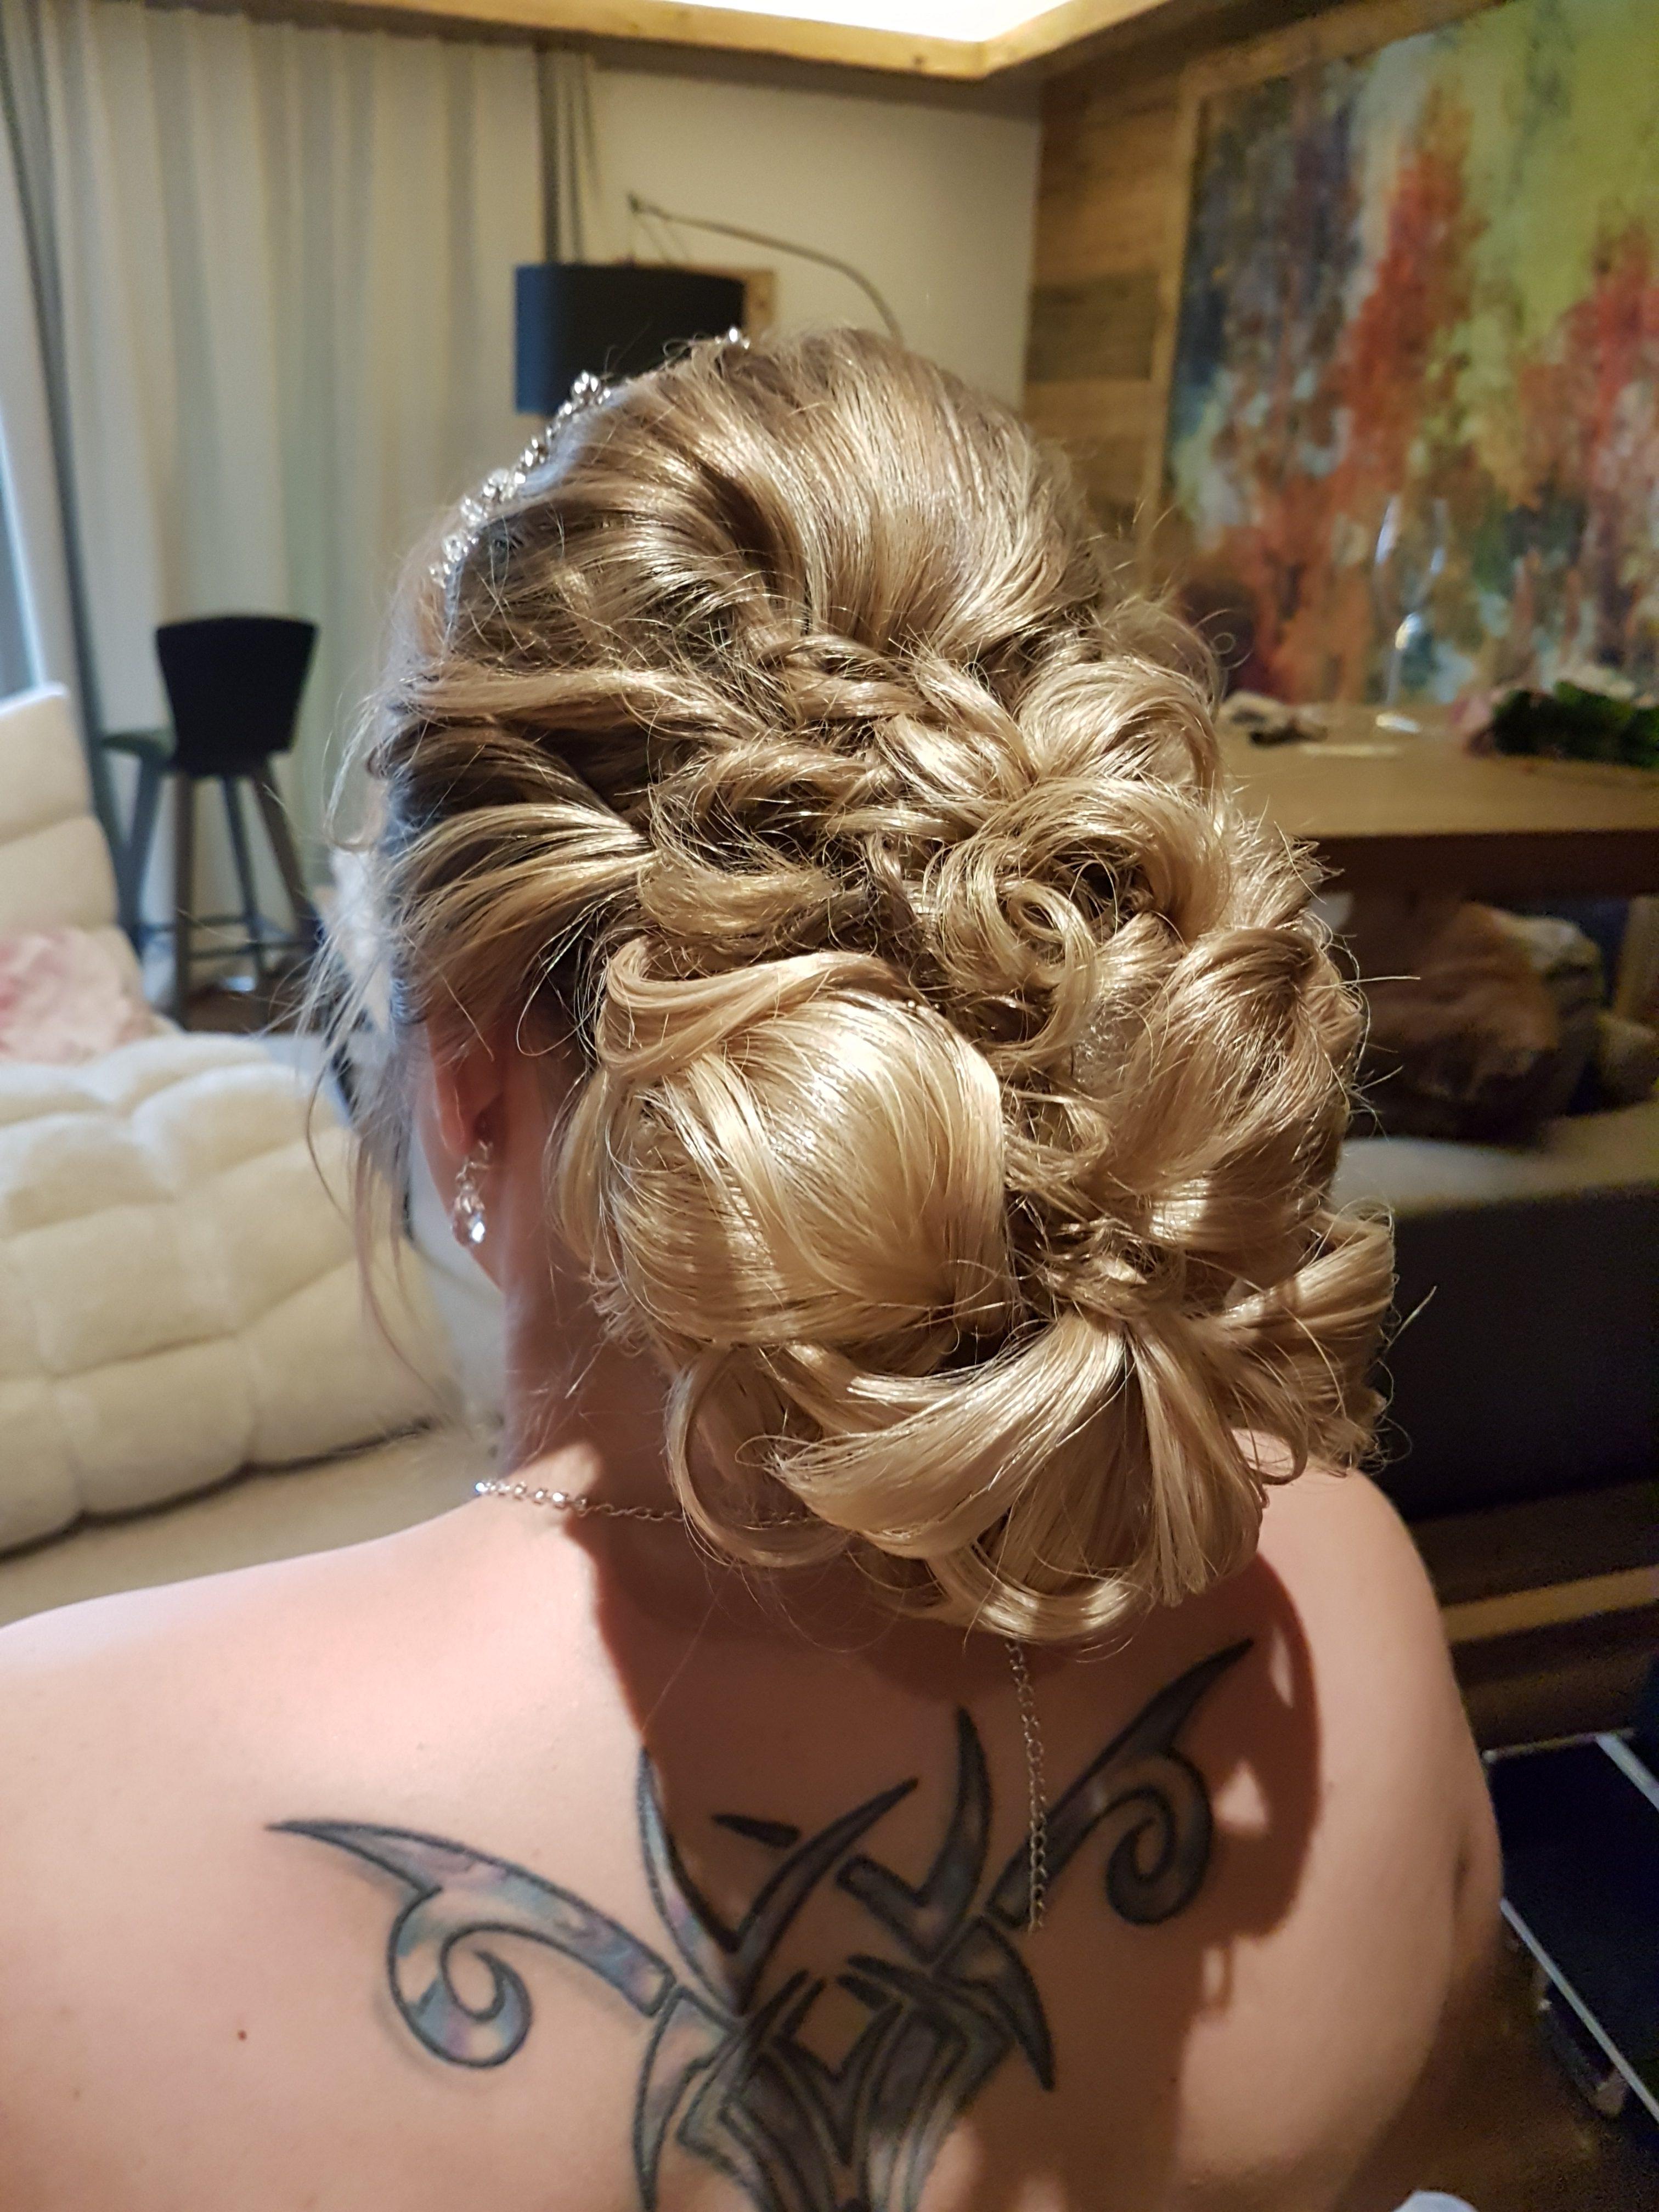 Franziska Bleher - stylistin / visagistin